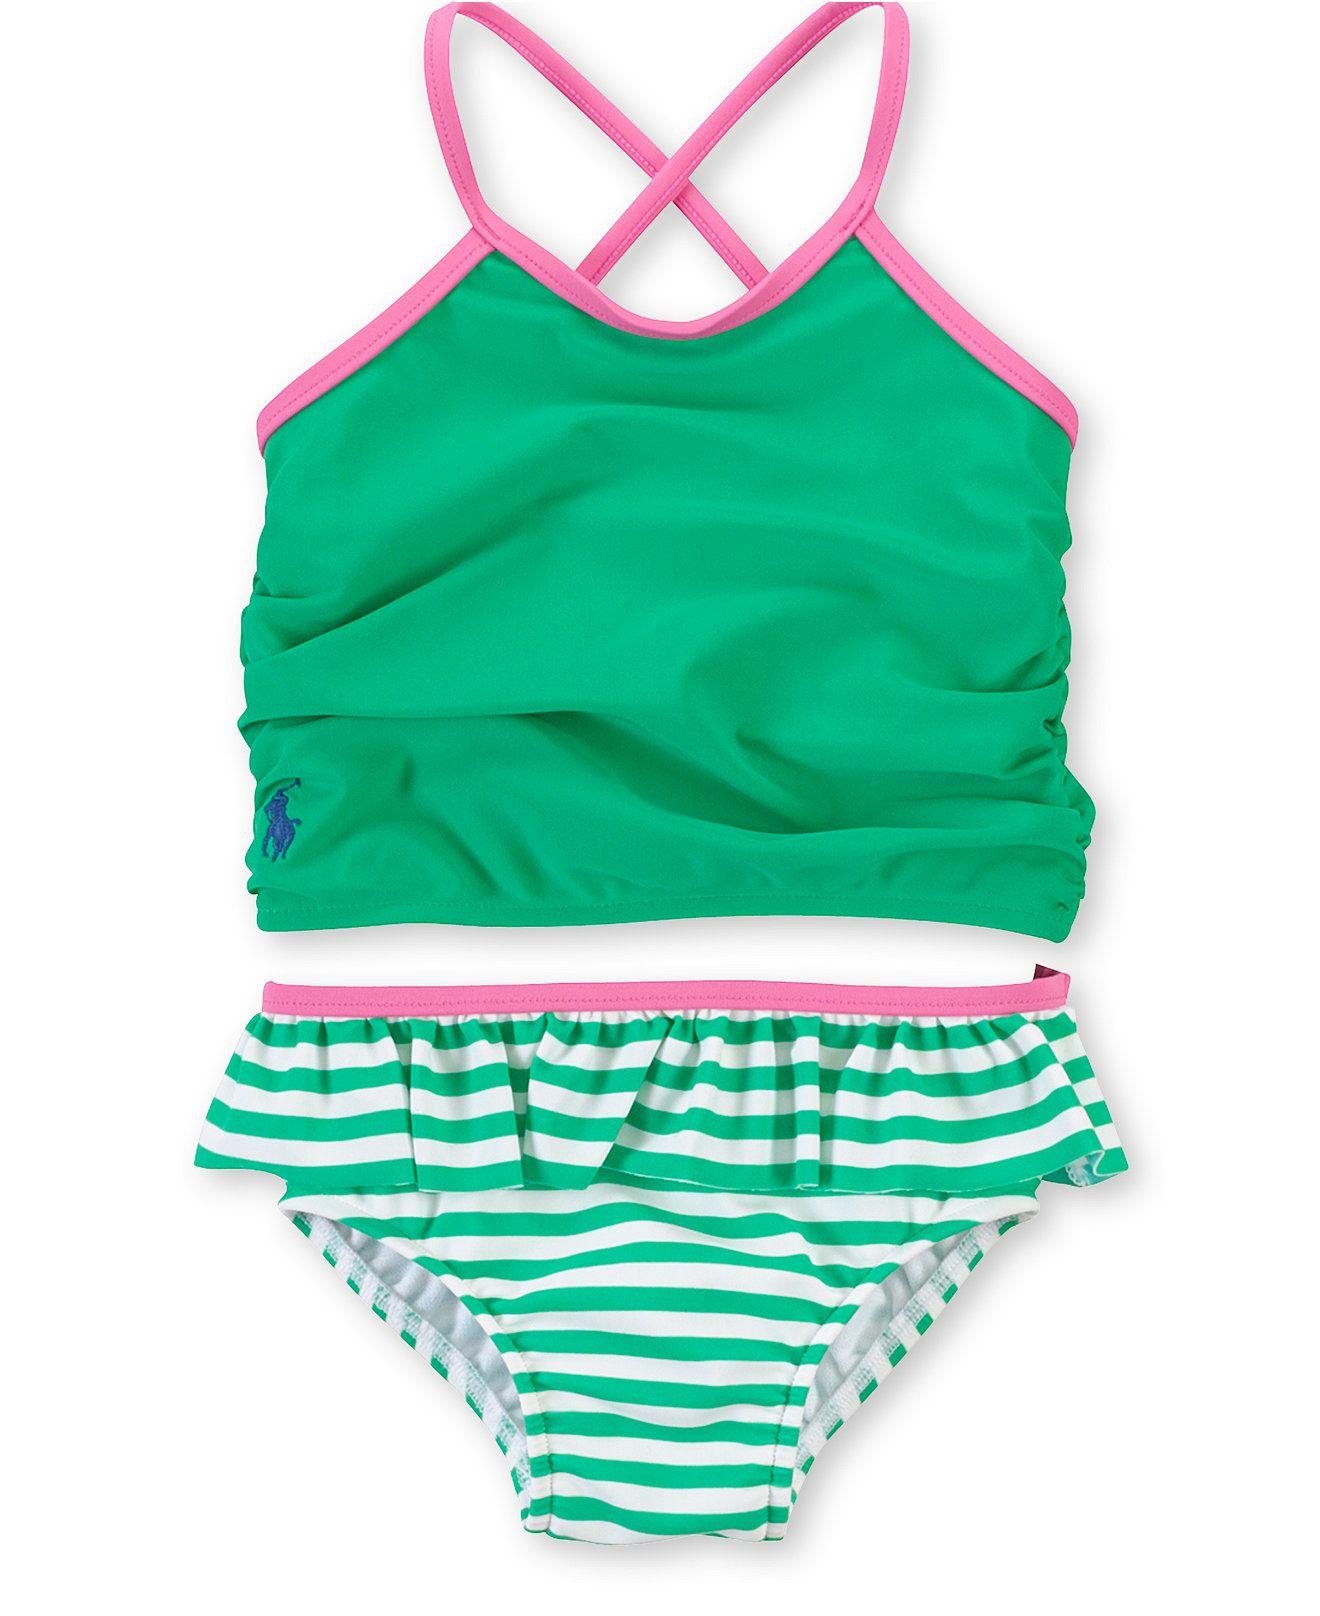 755379bb6d1eb Ralph Lauren Baby Girls' 2-Piece Tankini Swimsuit - Kids Baby Girl (0-24  months) - Macy's